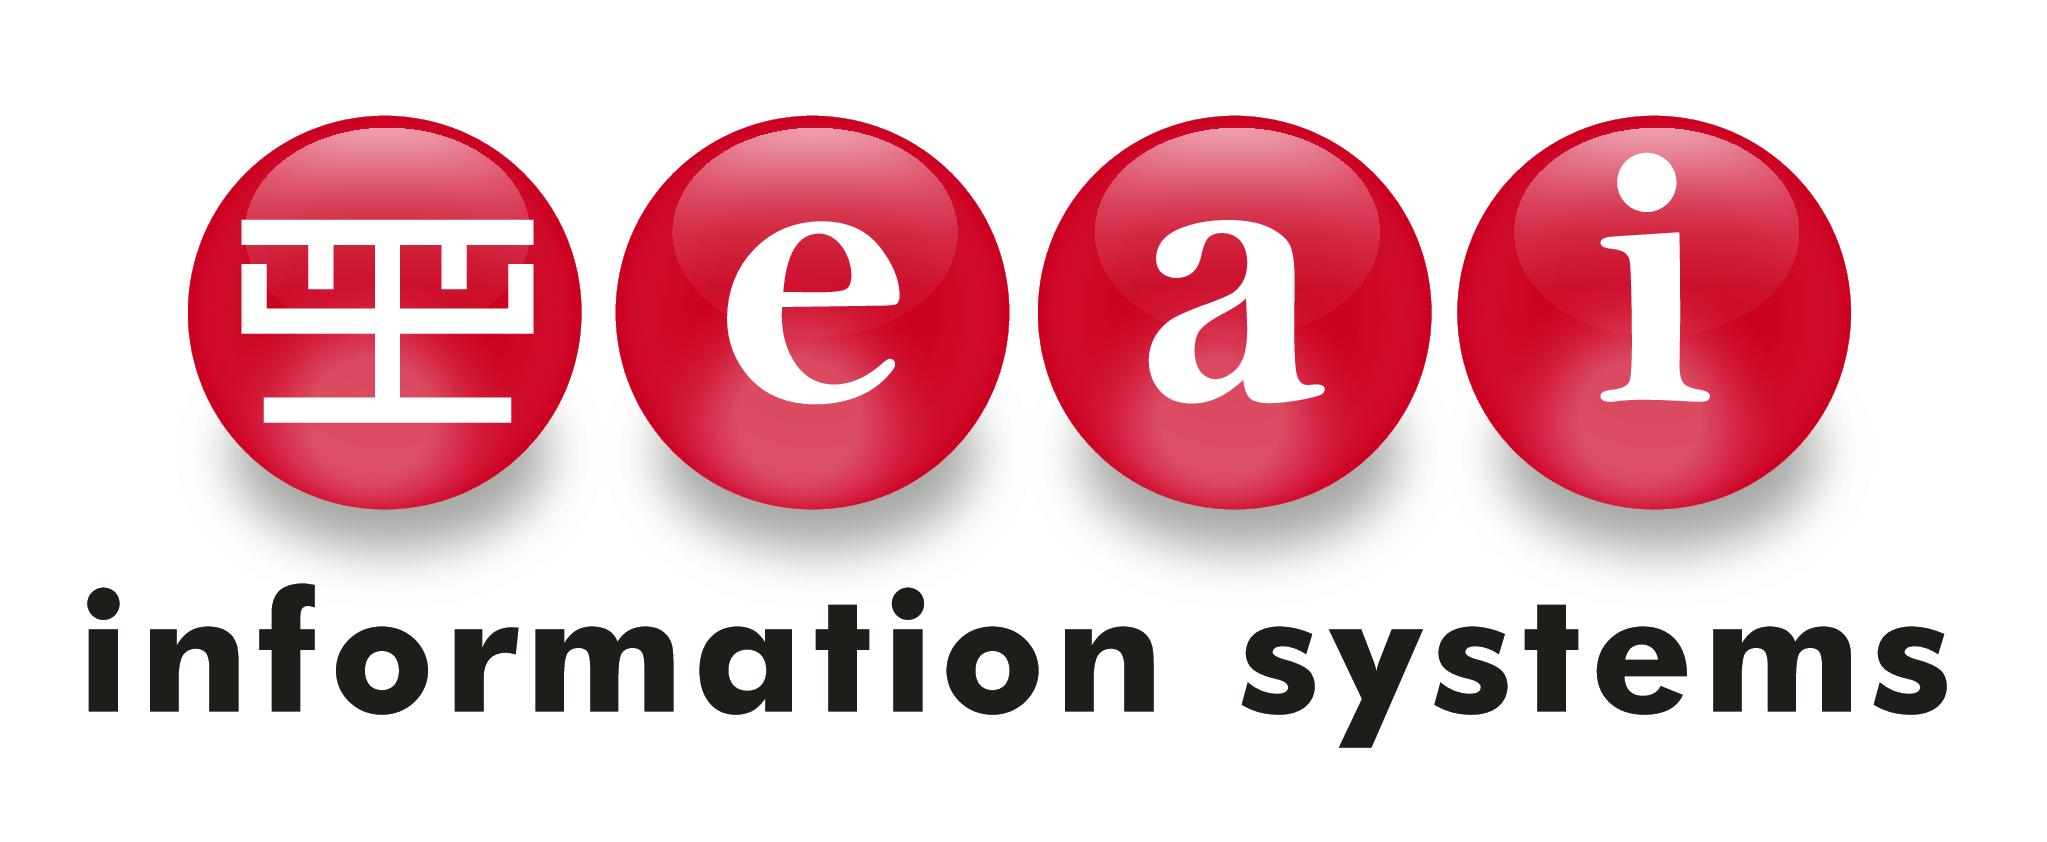 EAI_logo_info_PMS.ai ok